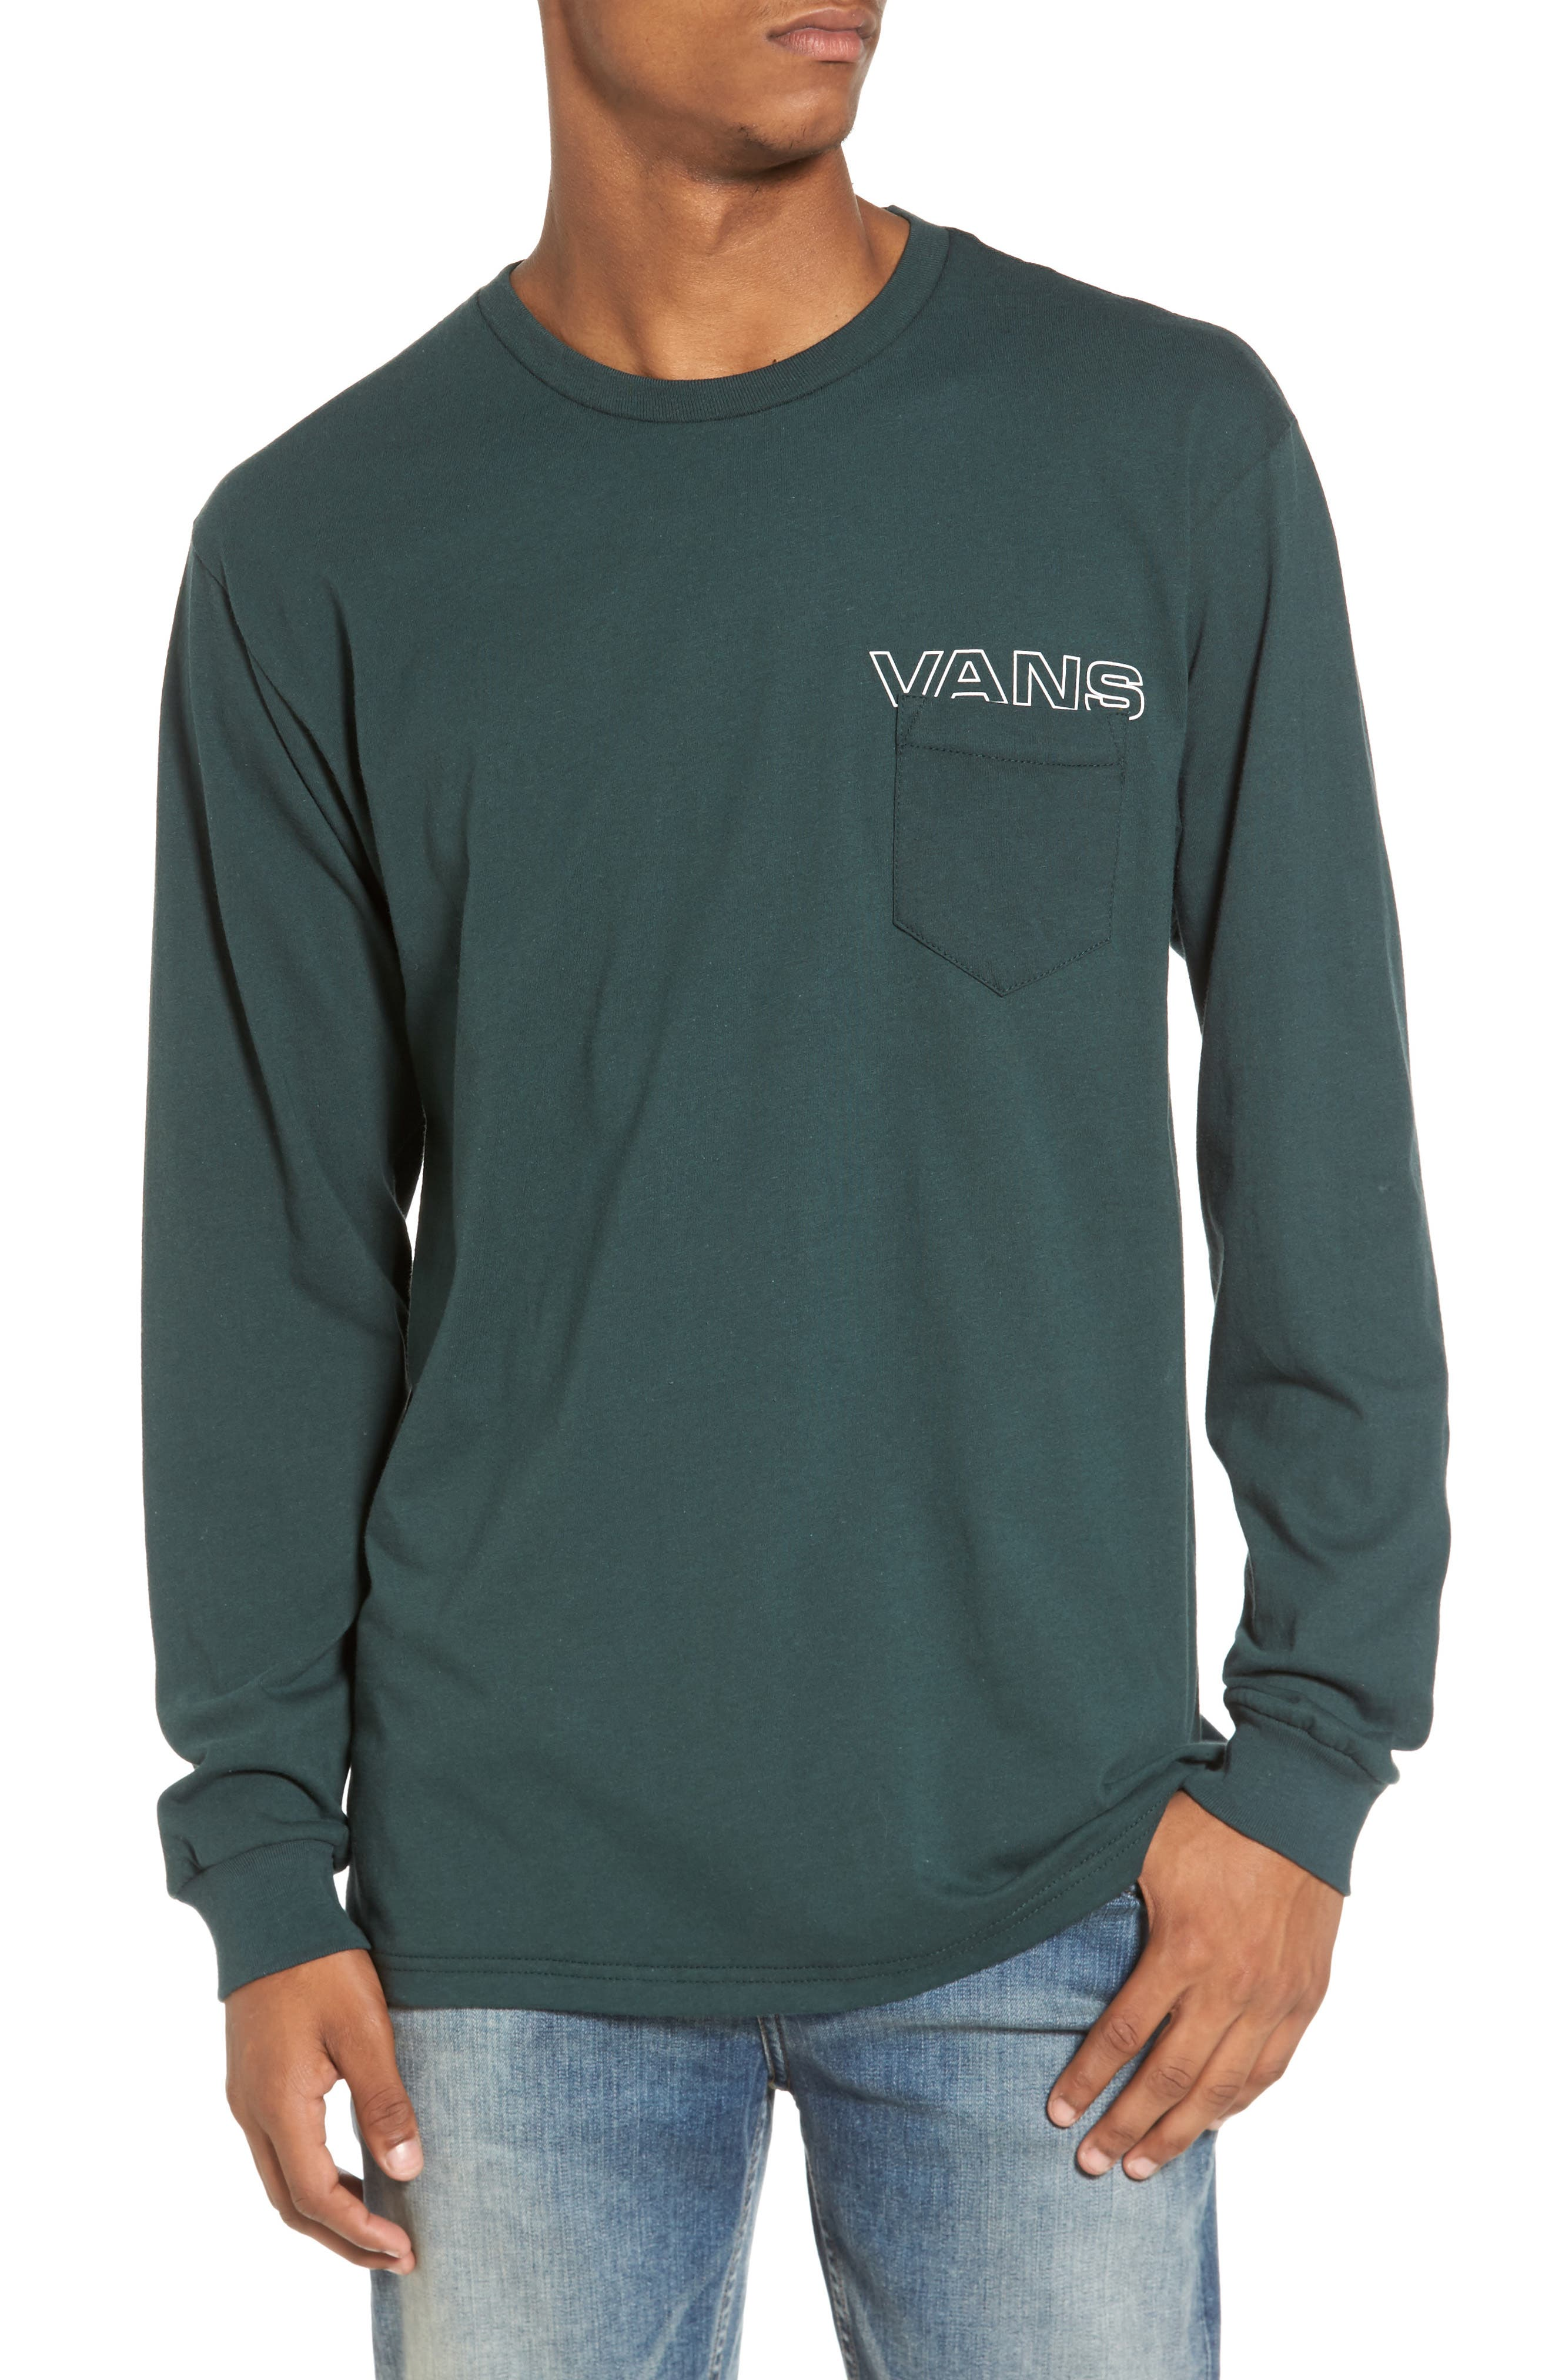 Vans Simple T-Shirt